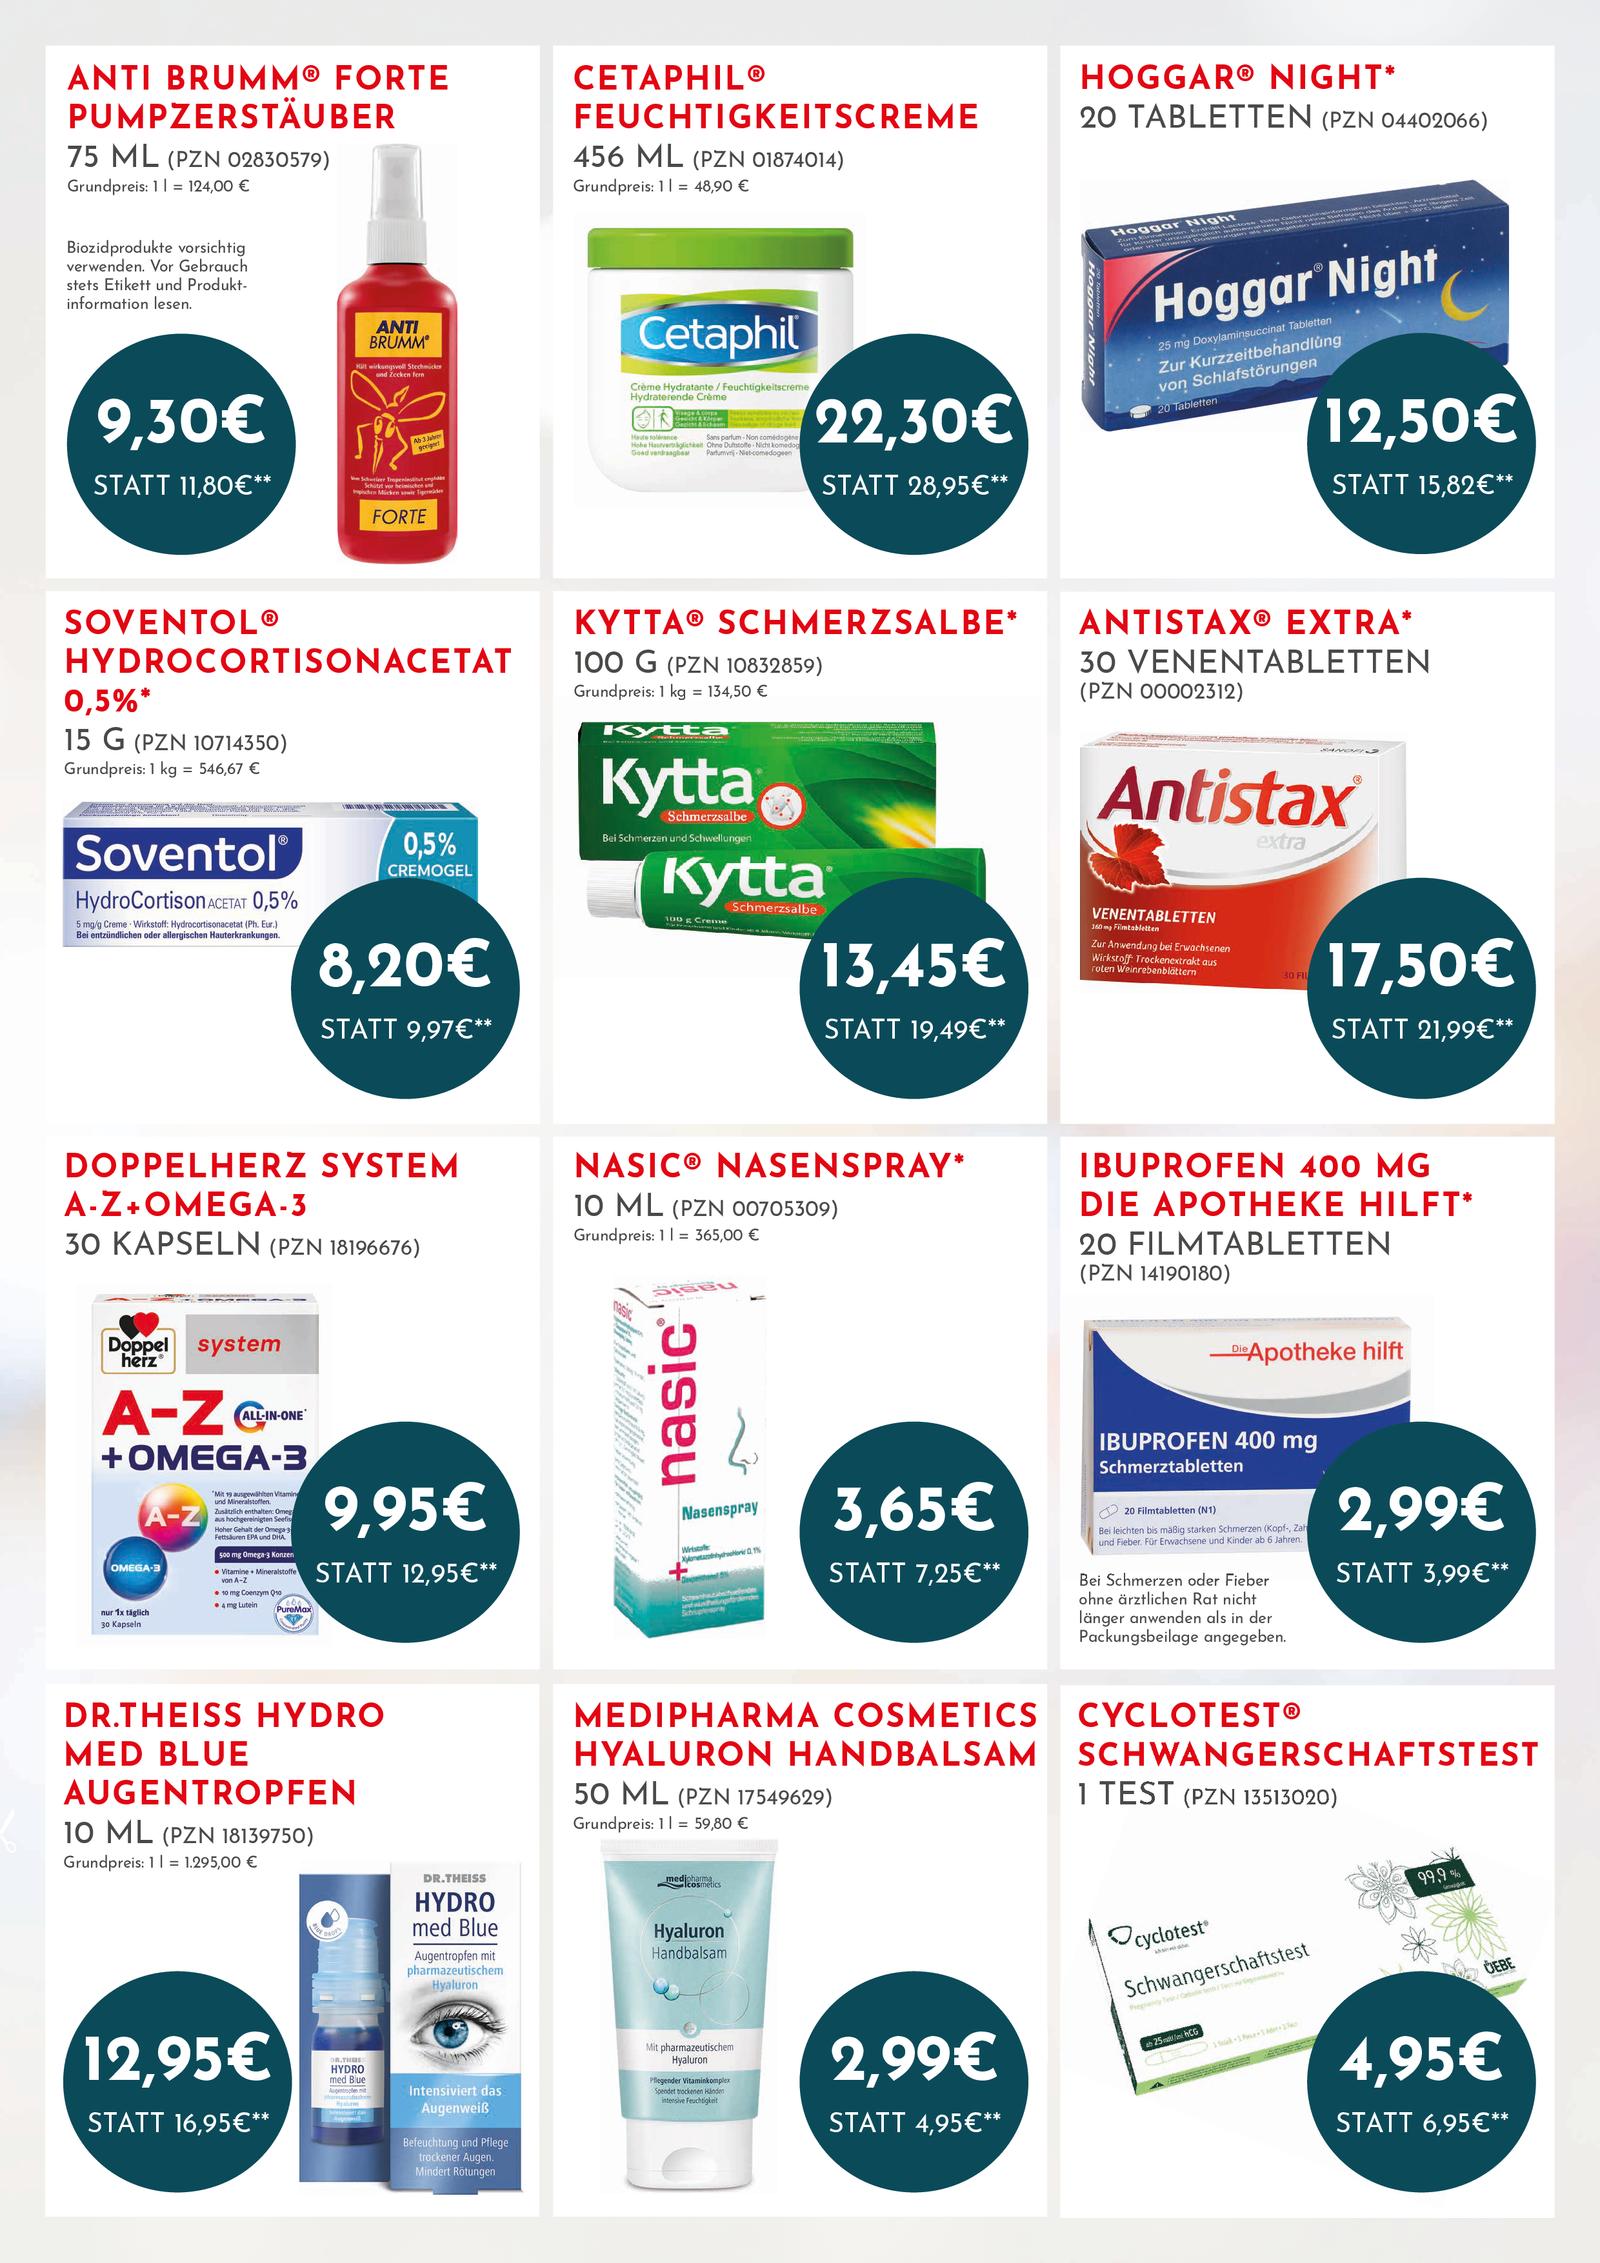 https://mein-uploads.apocdn.net/6951/leaflets/6951_flyer-Seite4.png